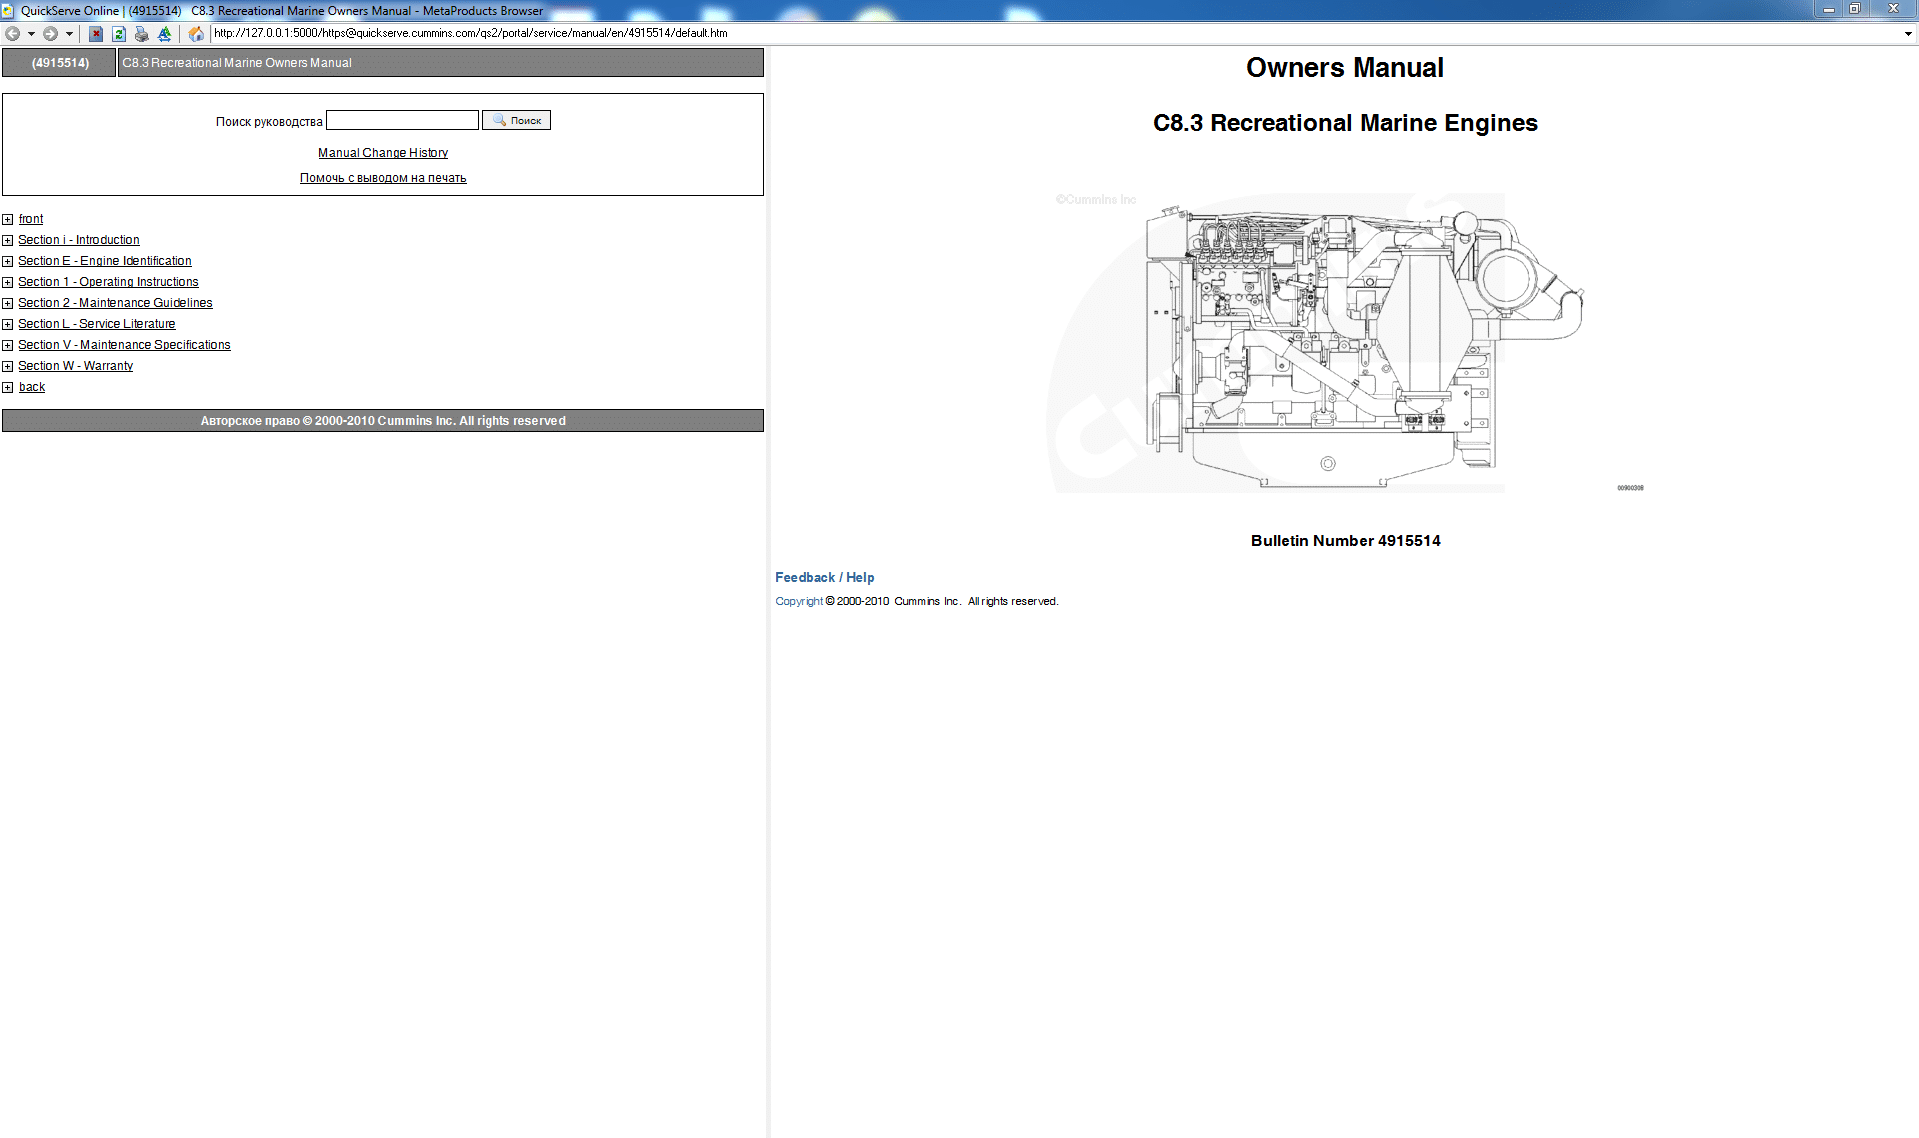 Cummins Owners Manual C8.3_Recreational_Marine Engine PDF